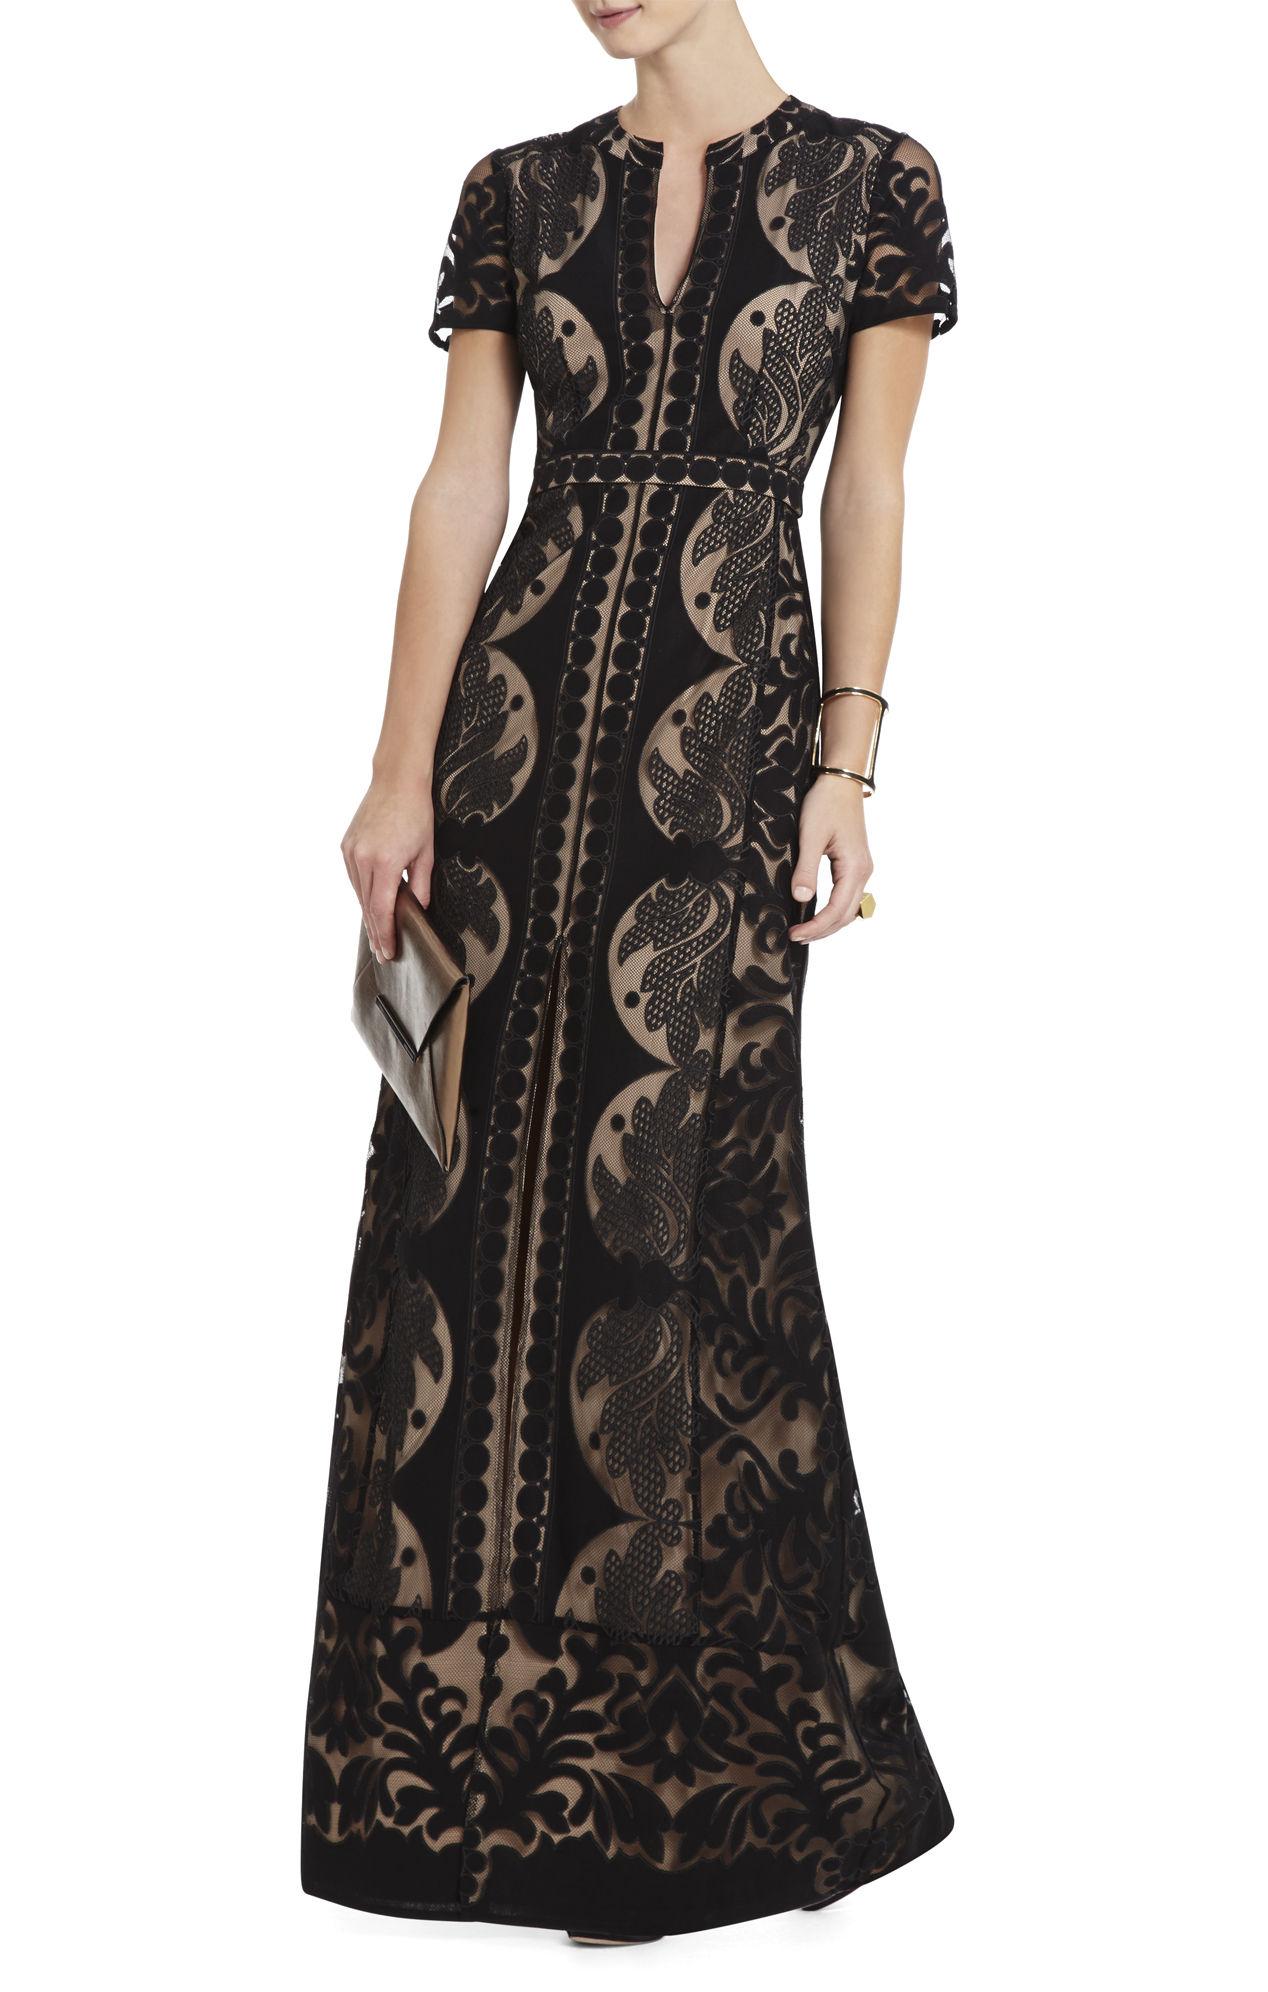 Bcbgmaxazria Cailean Short Sleeve Lace Dress In Black Lyst